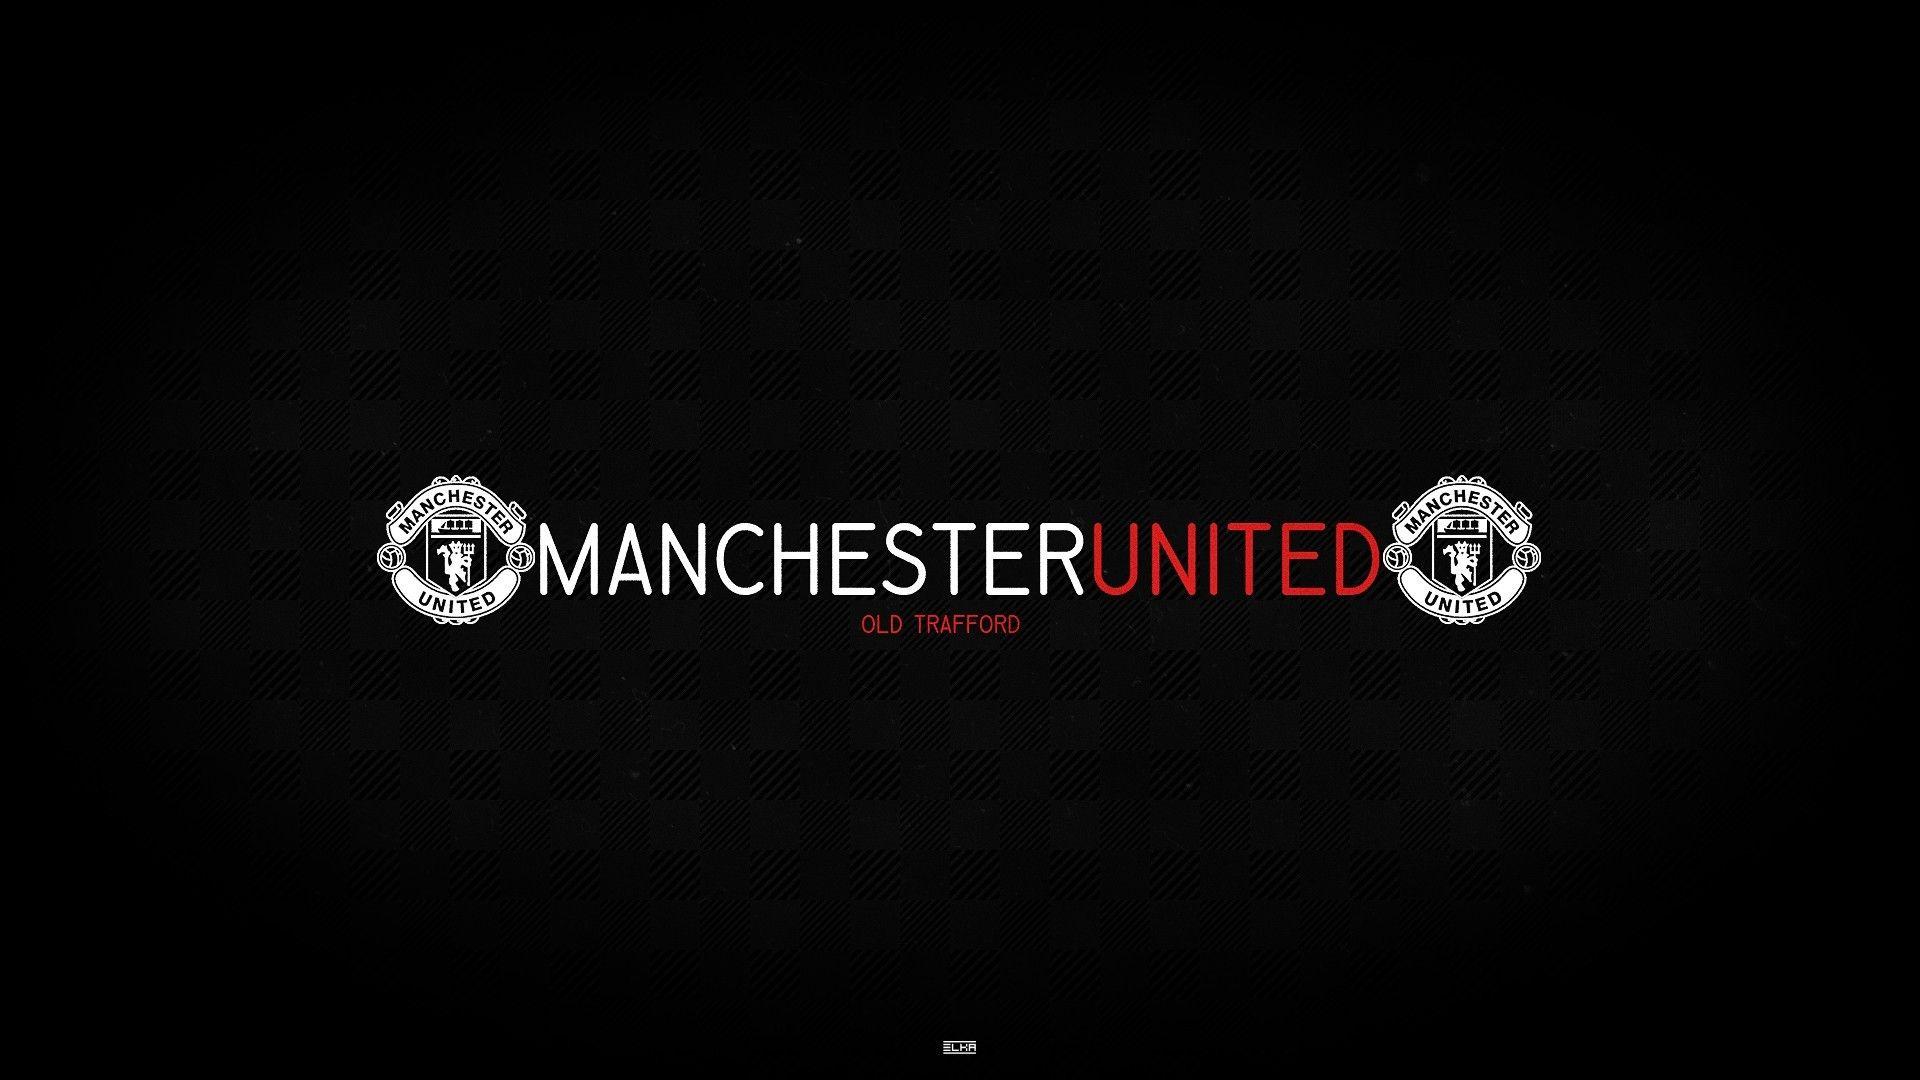 1920x1080 Black Background Manchester United Logo Full Top 1920x1080